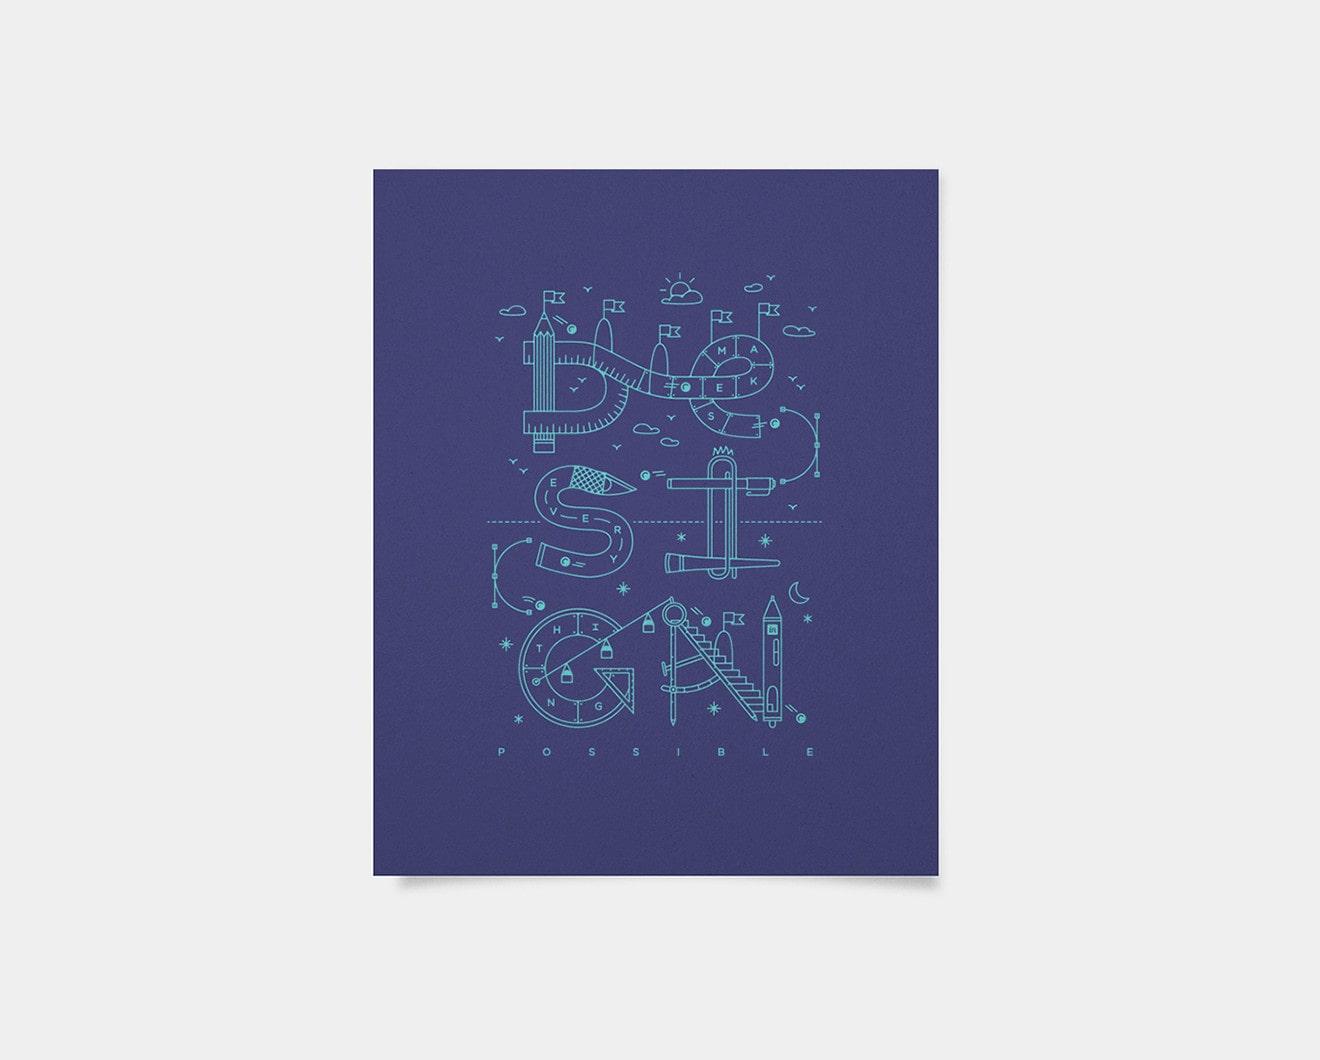 Design Makes Everything Possible - Gerren Lamson